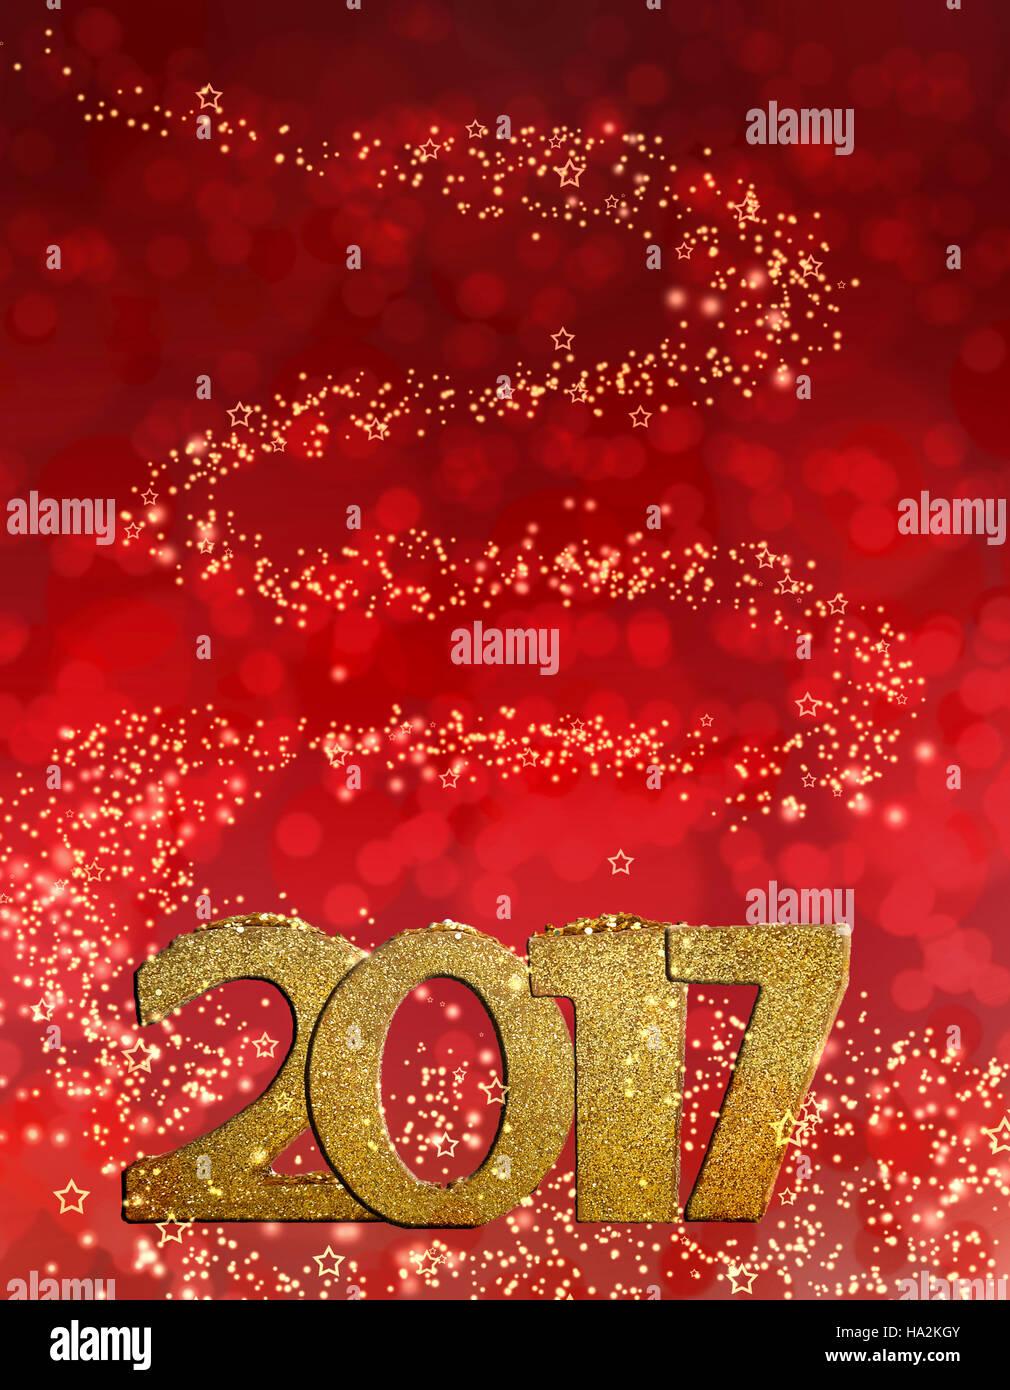 golden figures 2017 on bright lights background - Stock Image